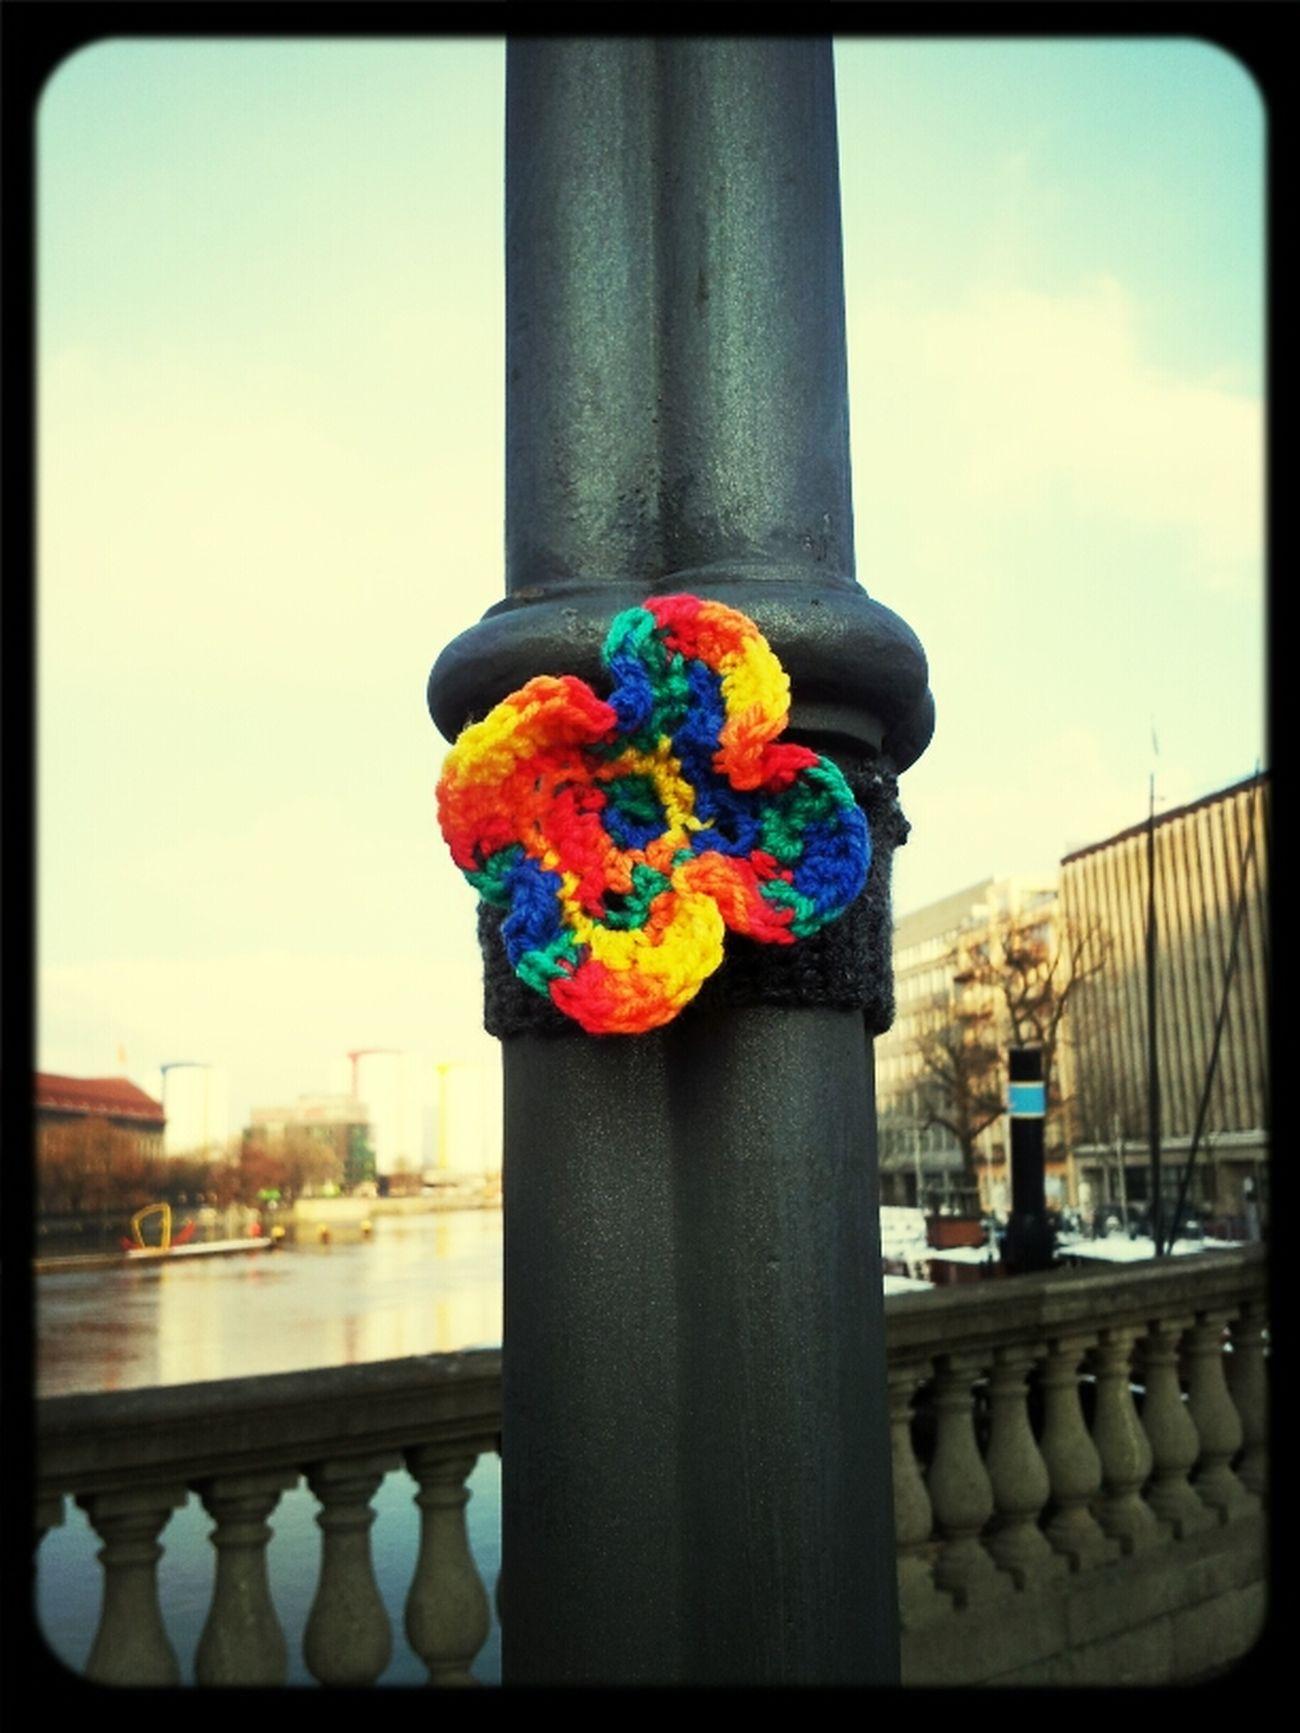 Streetphotography Berlin Flowers Street Photography Street Fashion